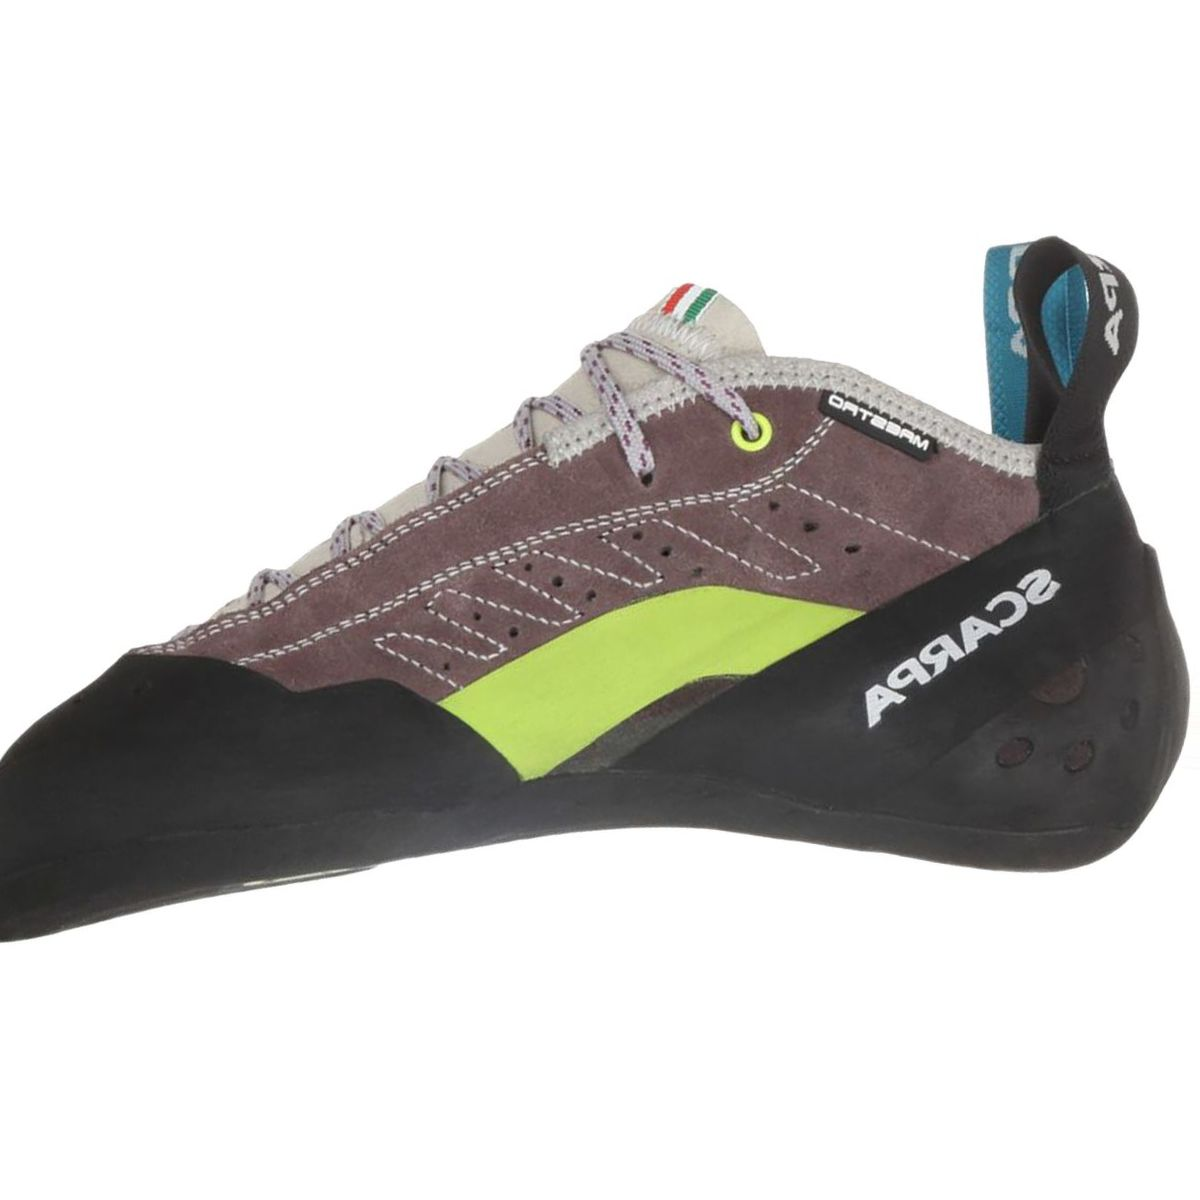 Scarpa Maestro Mid Eco Climbing Shoe - Women's